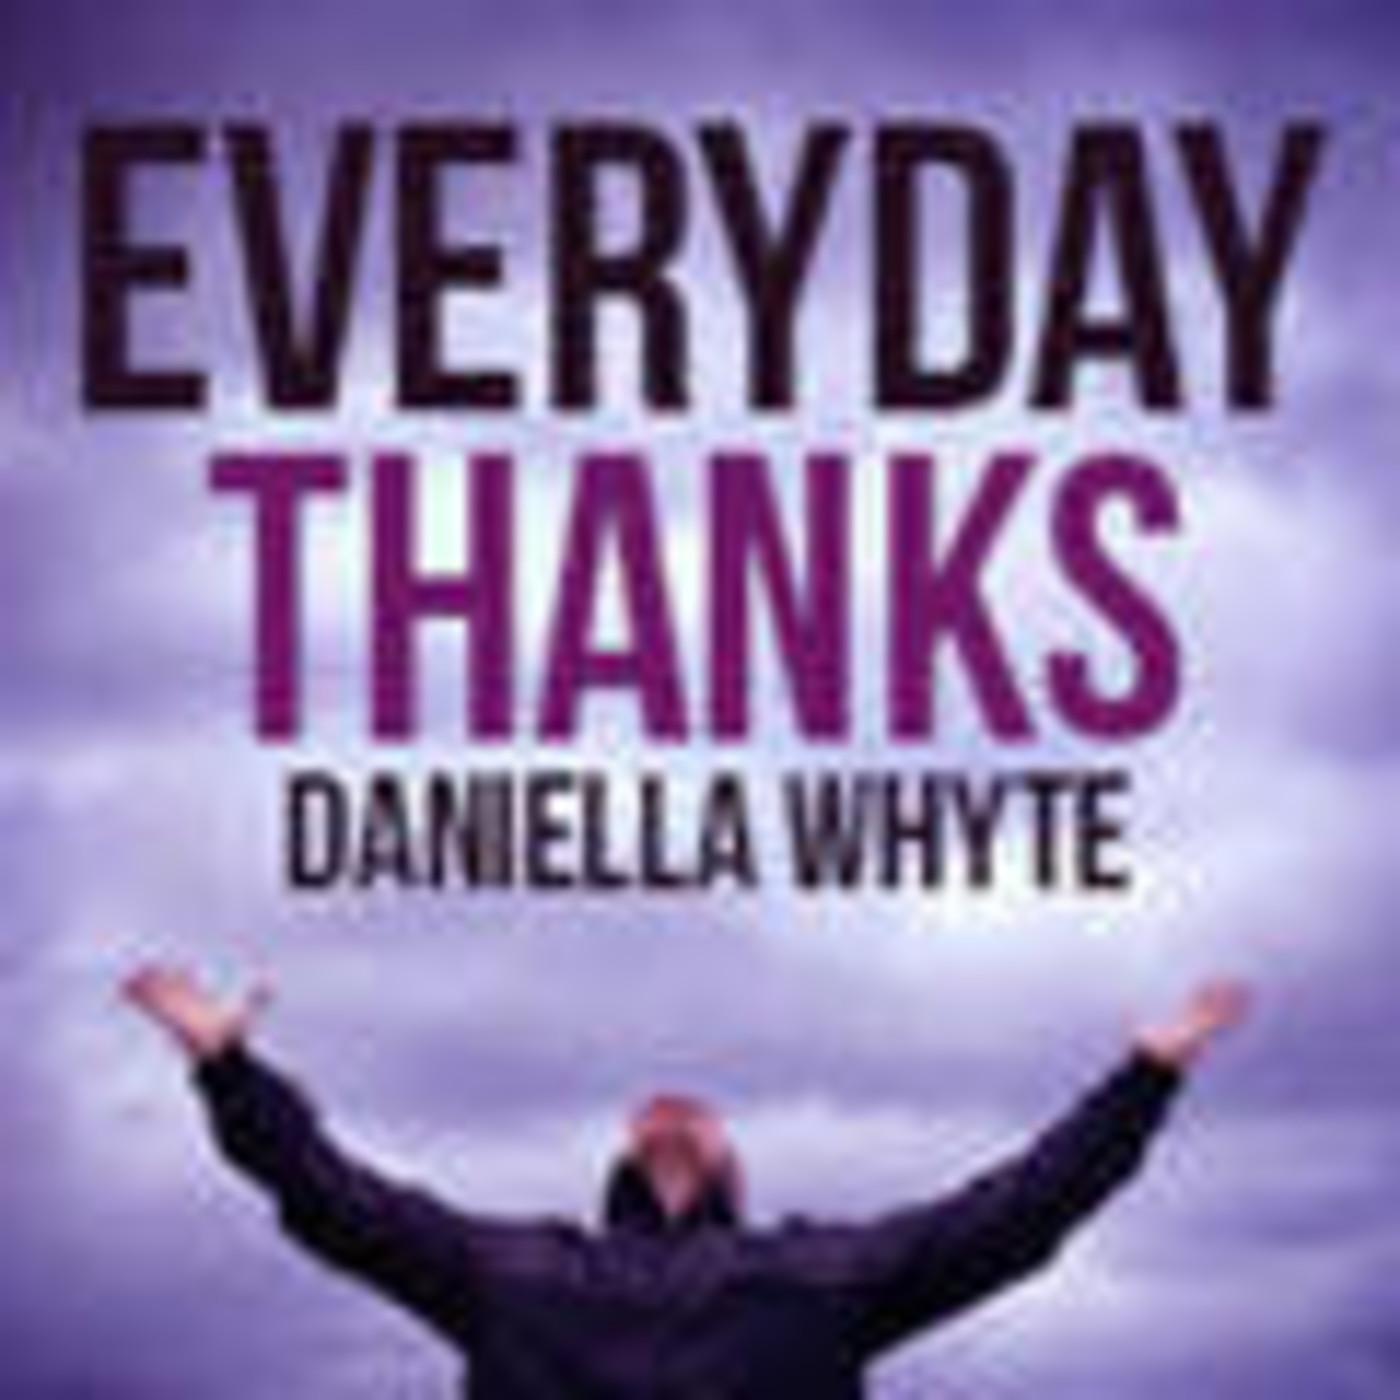 Daniella Whyte